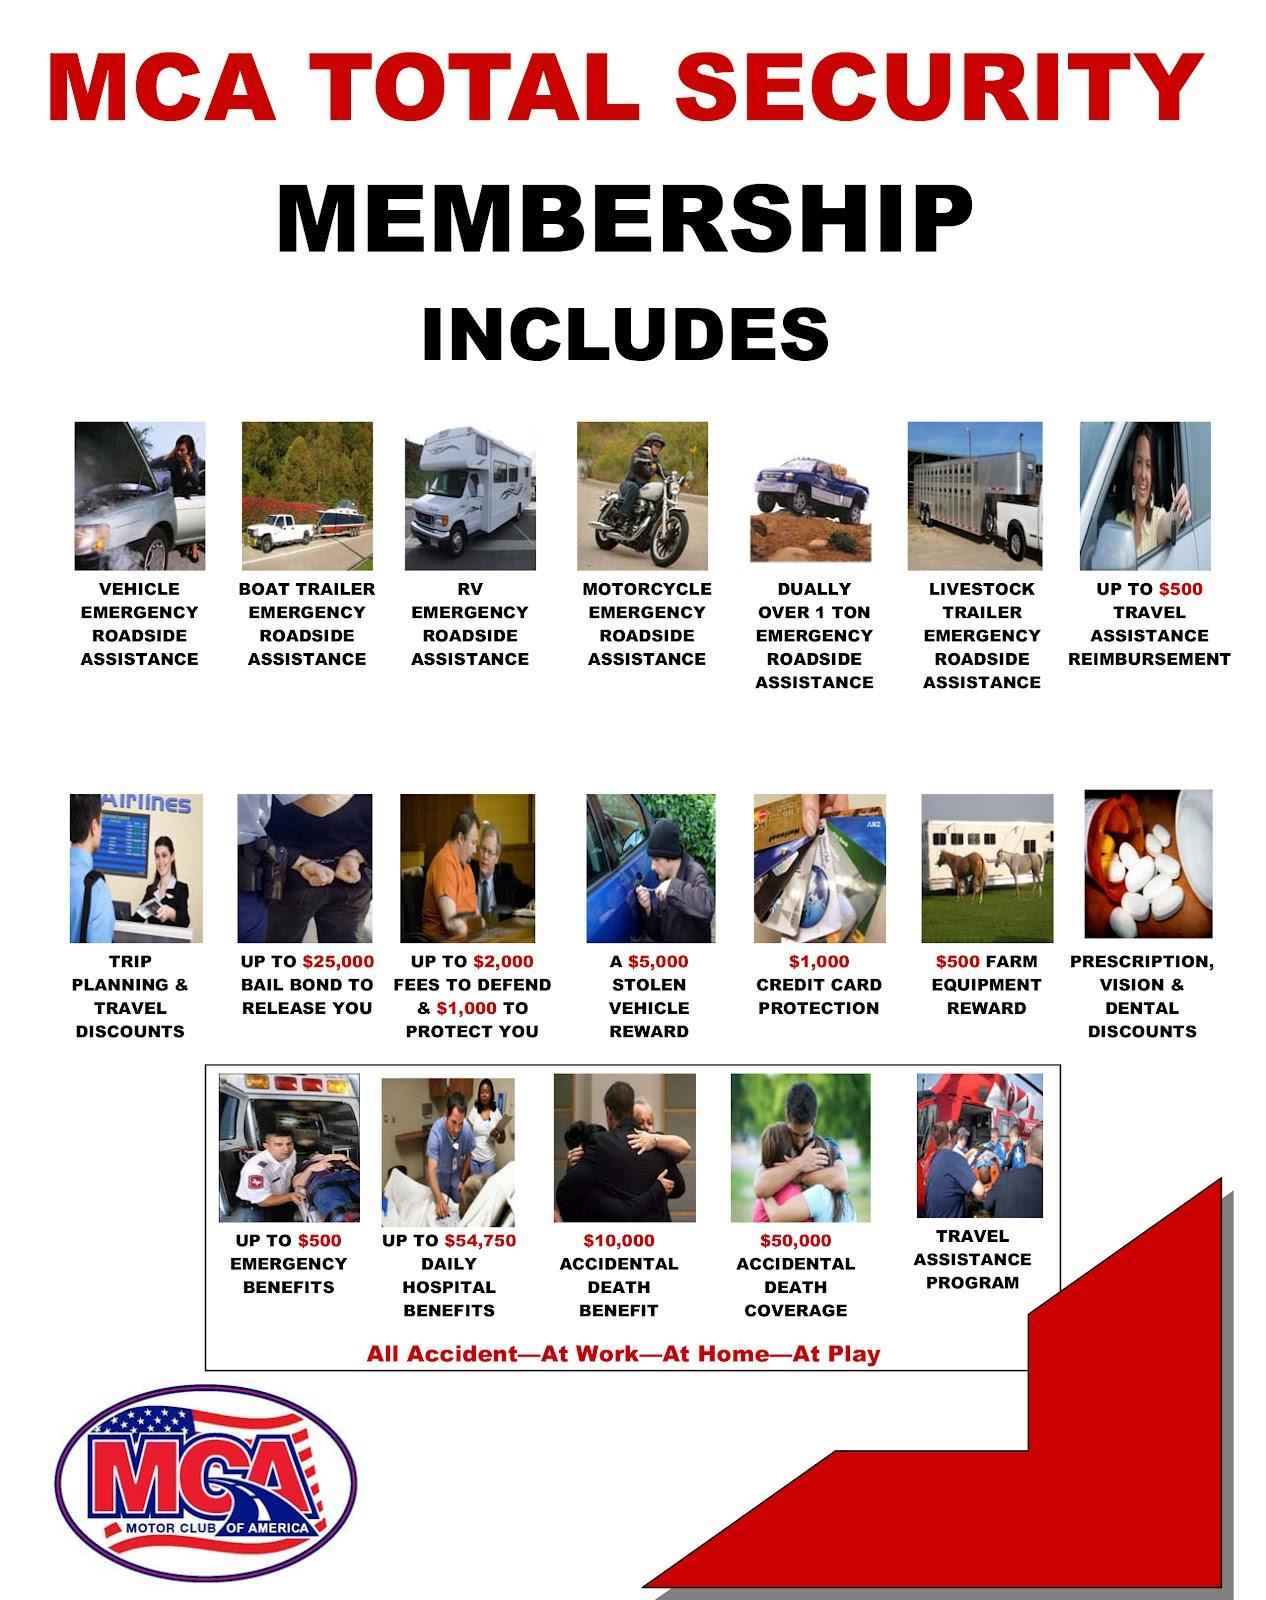 Motor club of america motor club of america Motor club of america careers